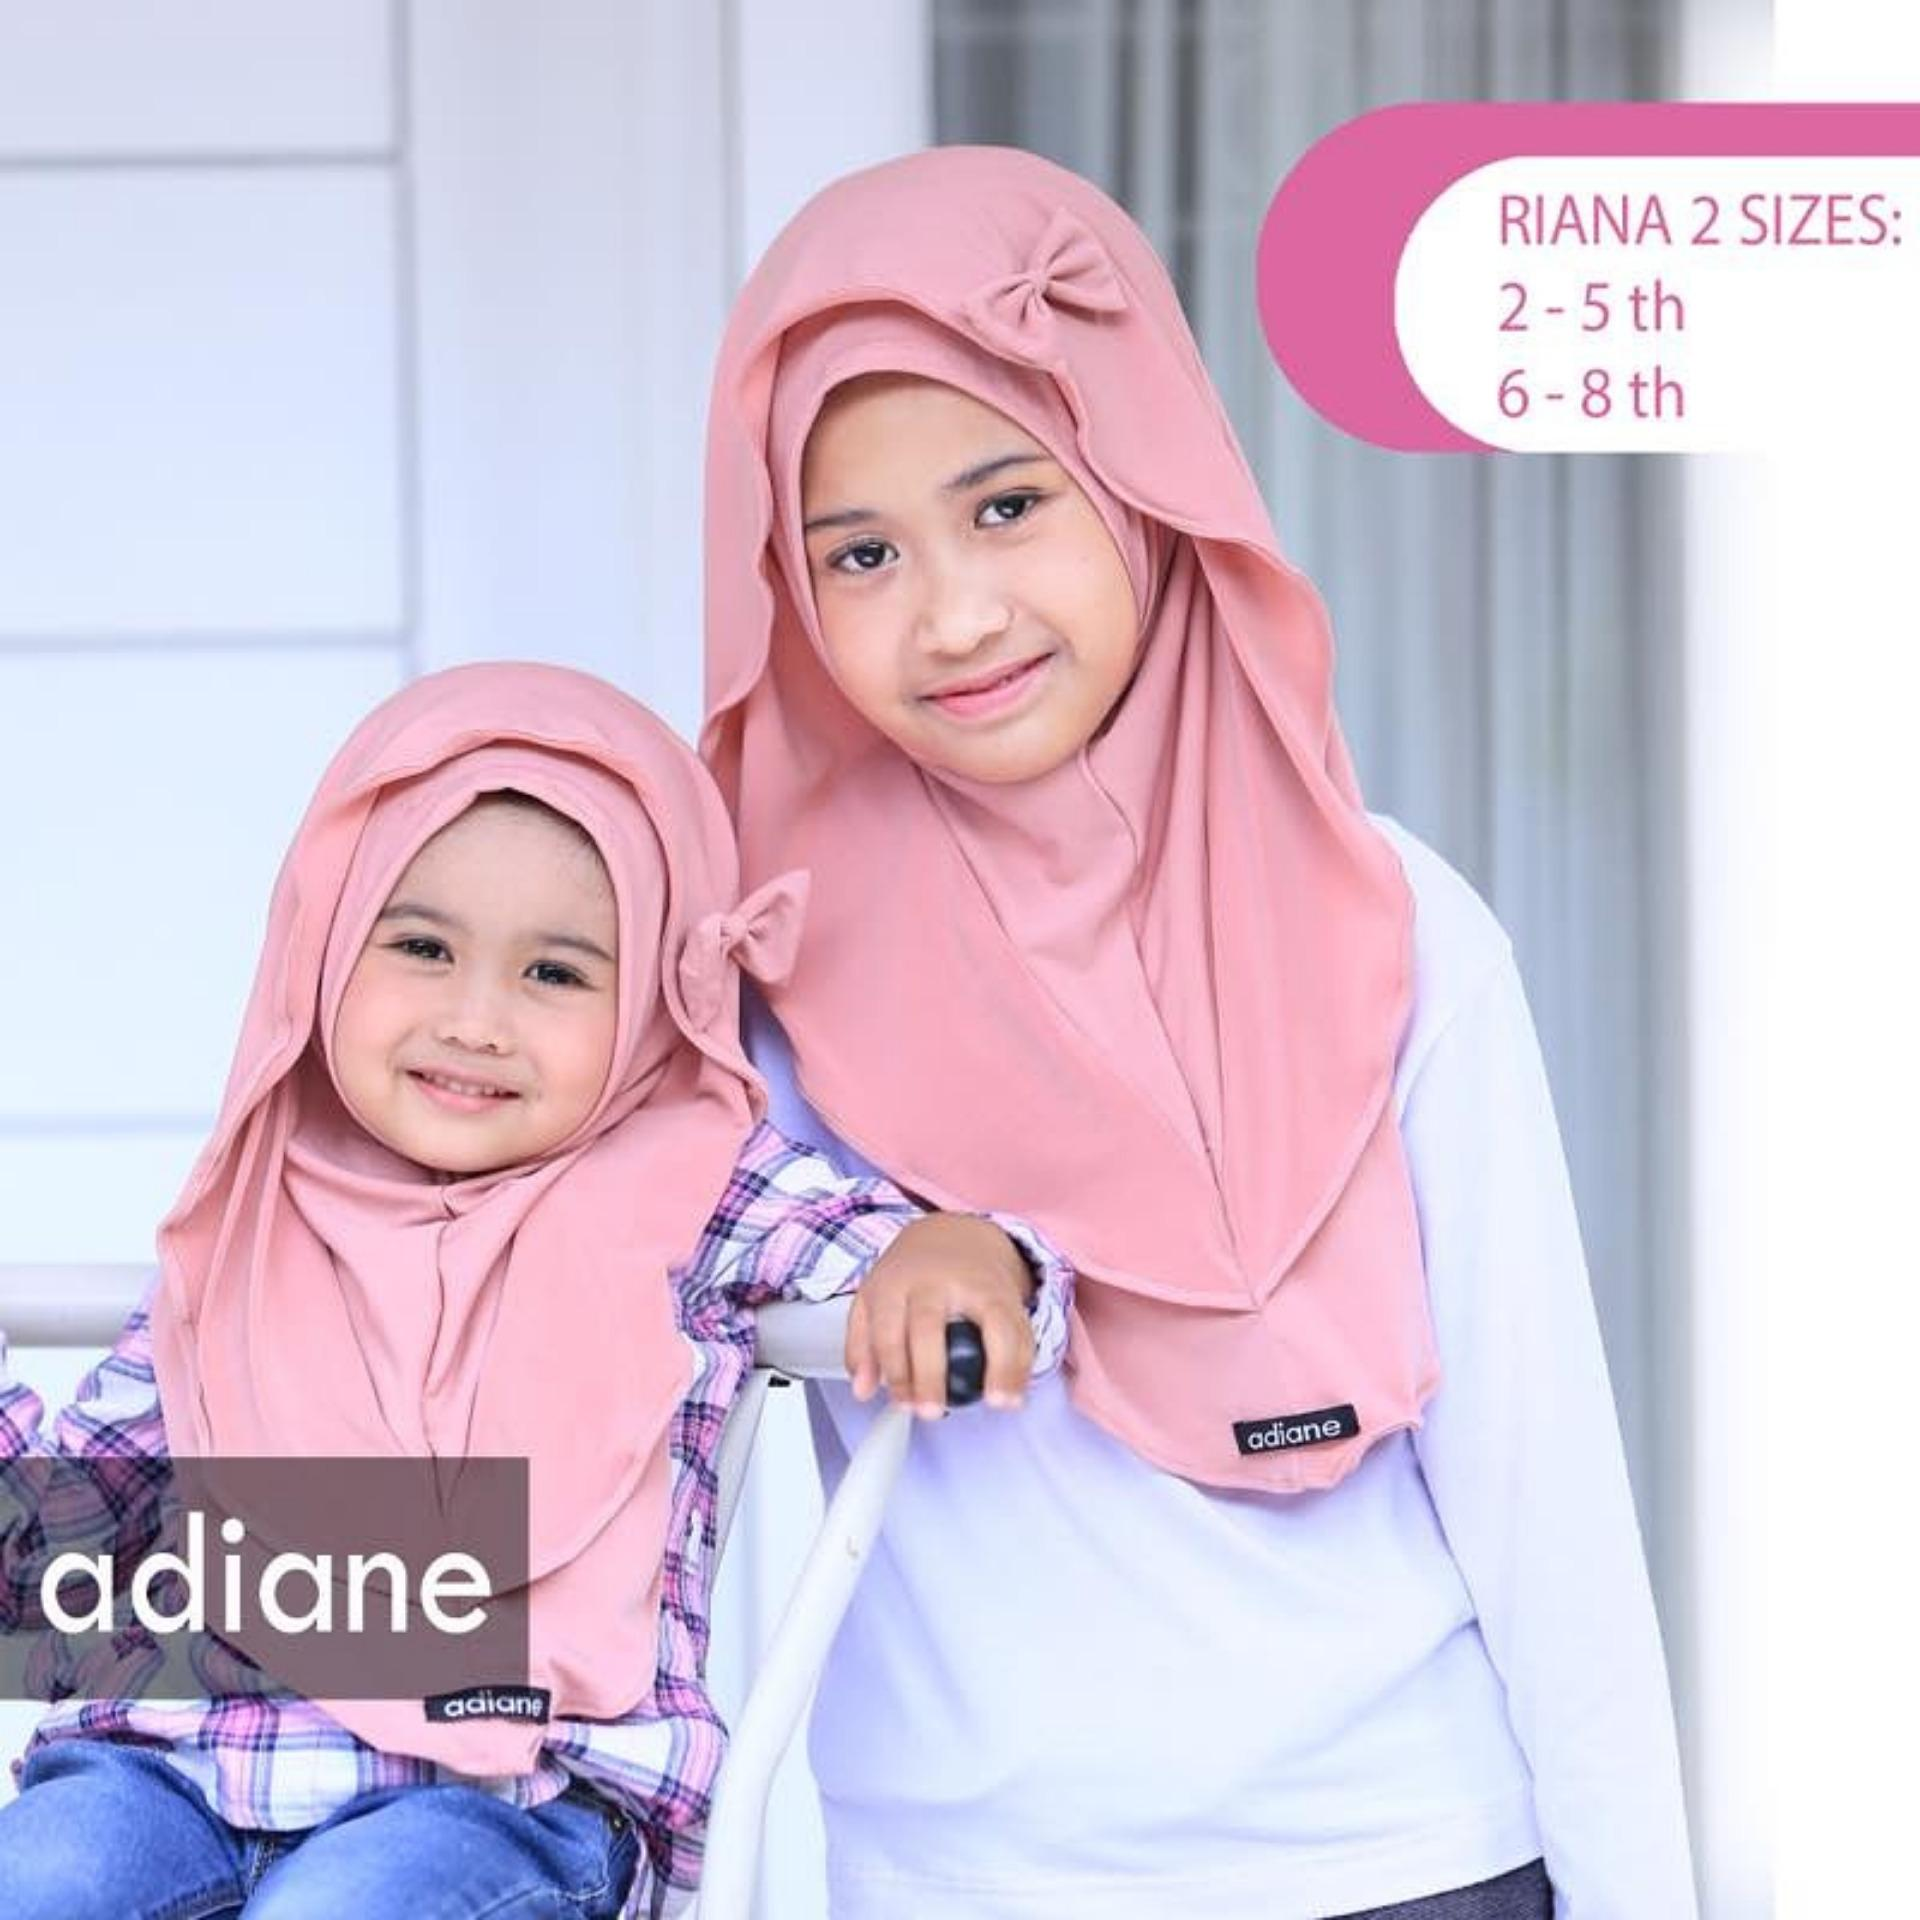 Jual Hqo Kerudung Hijab Jilbab Pashmina Instan Anak Riana Pink Di Indonesia